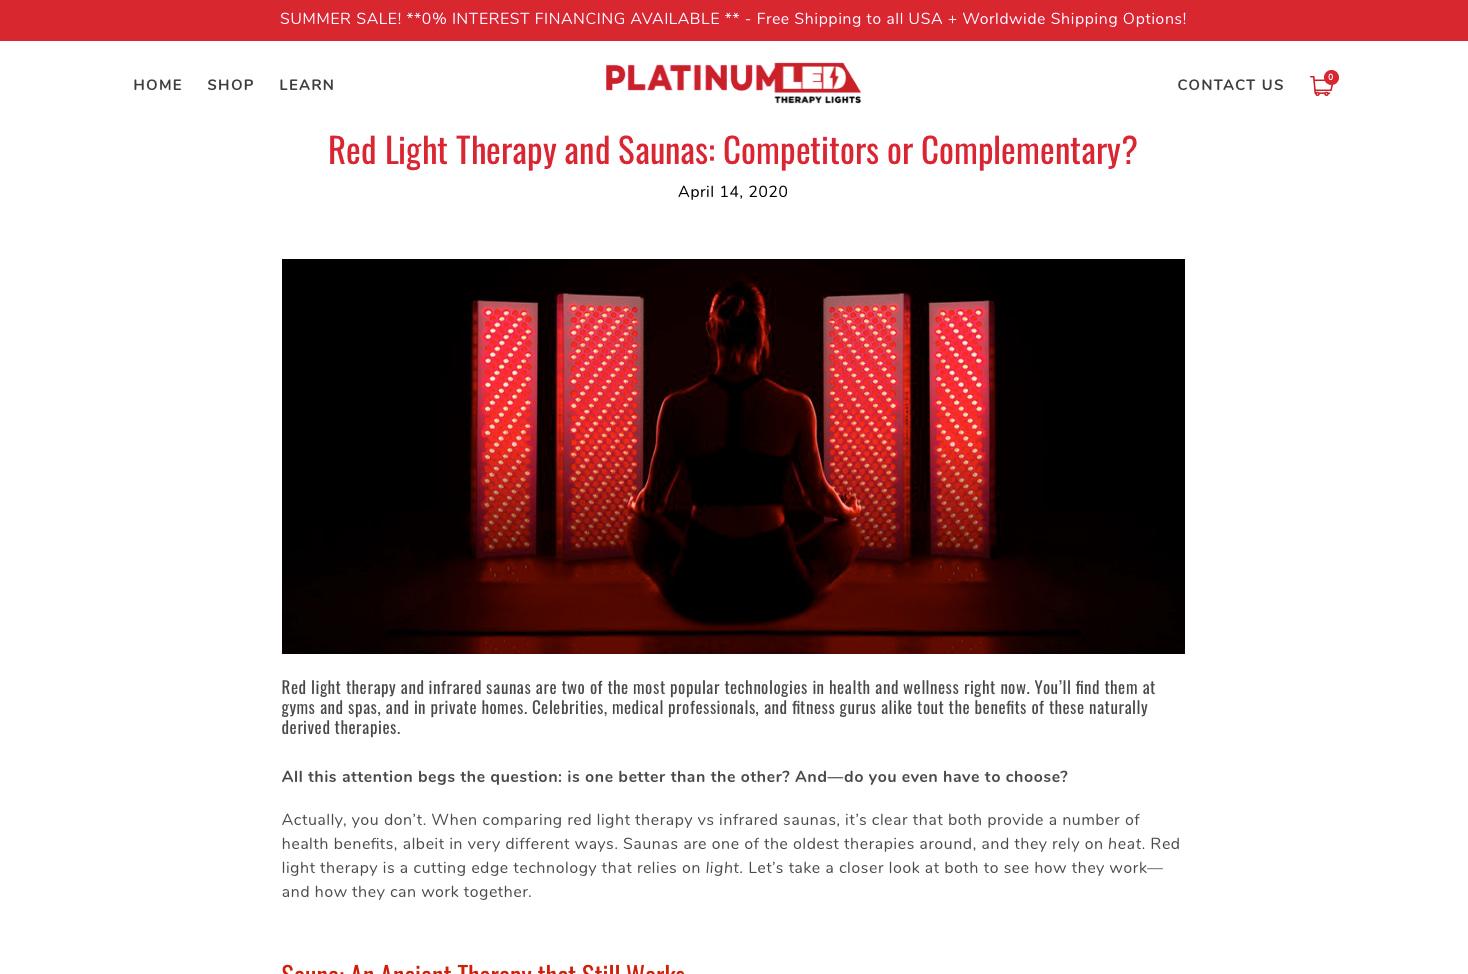 Platinum LED Therapy Lights Blog Snapshot